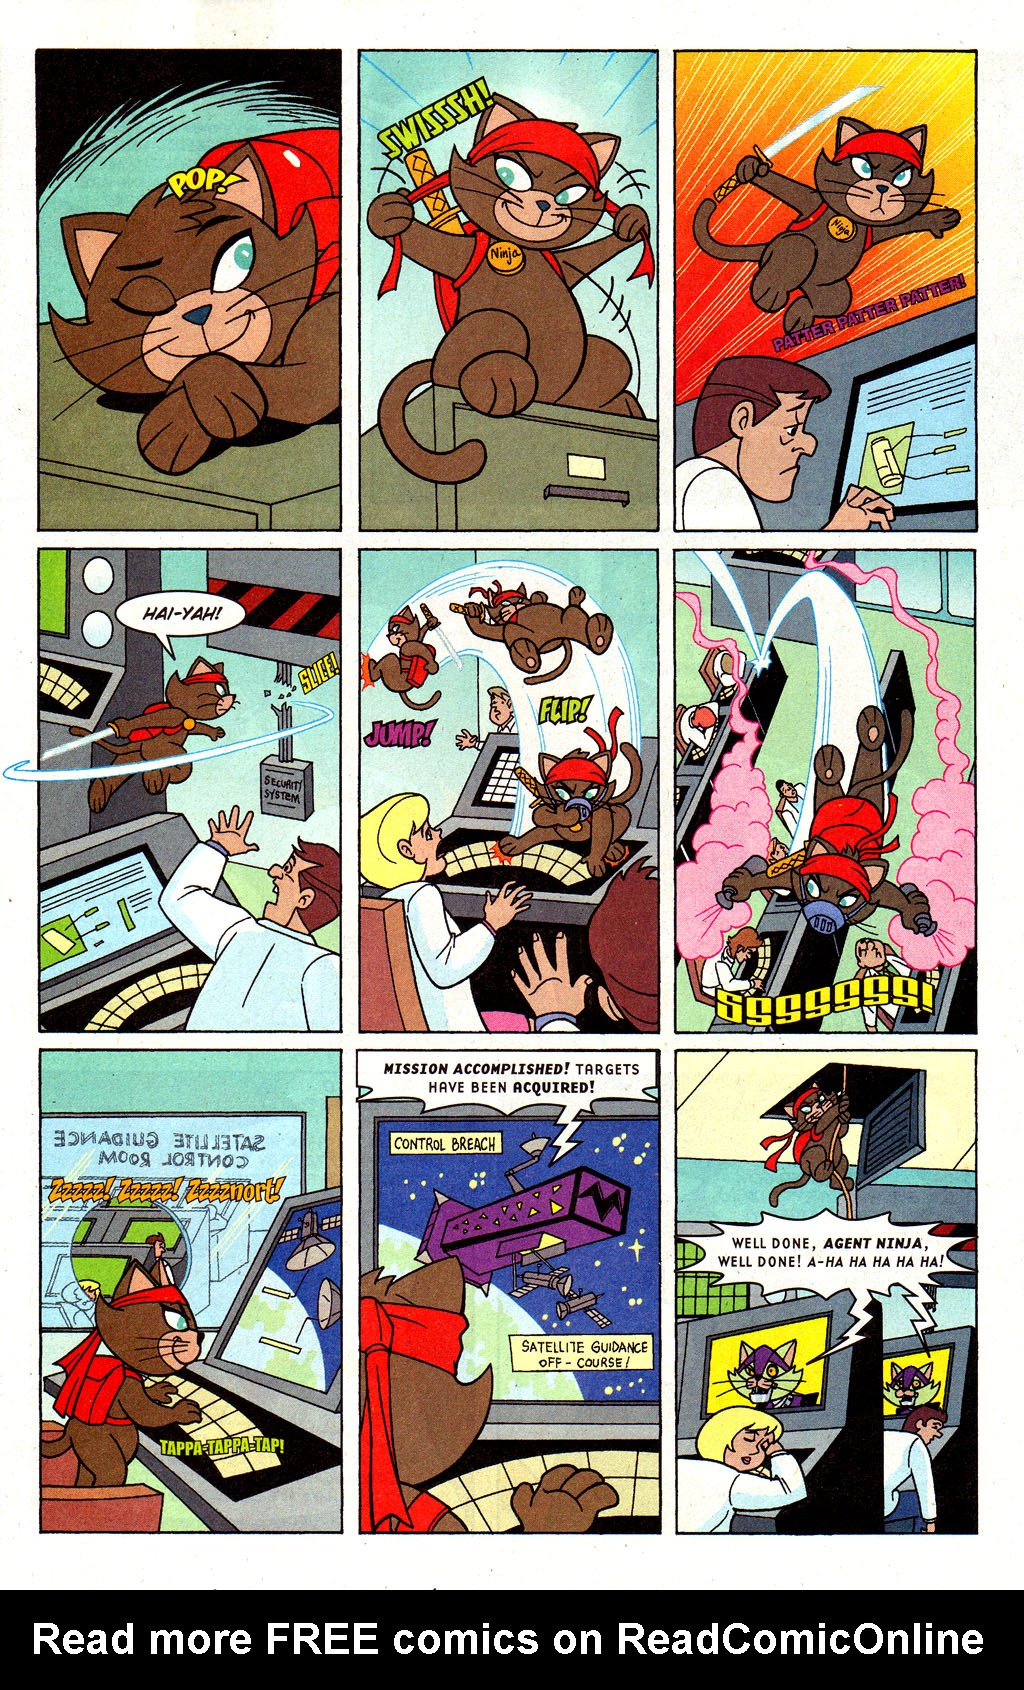 Read online Krypto the Superdog comic -  Issue #3 - 4